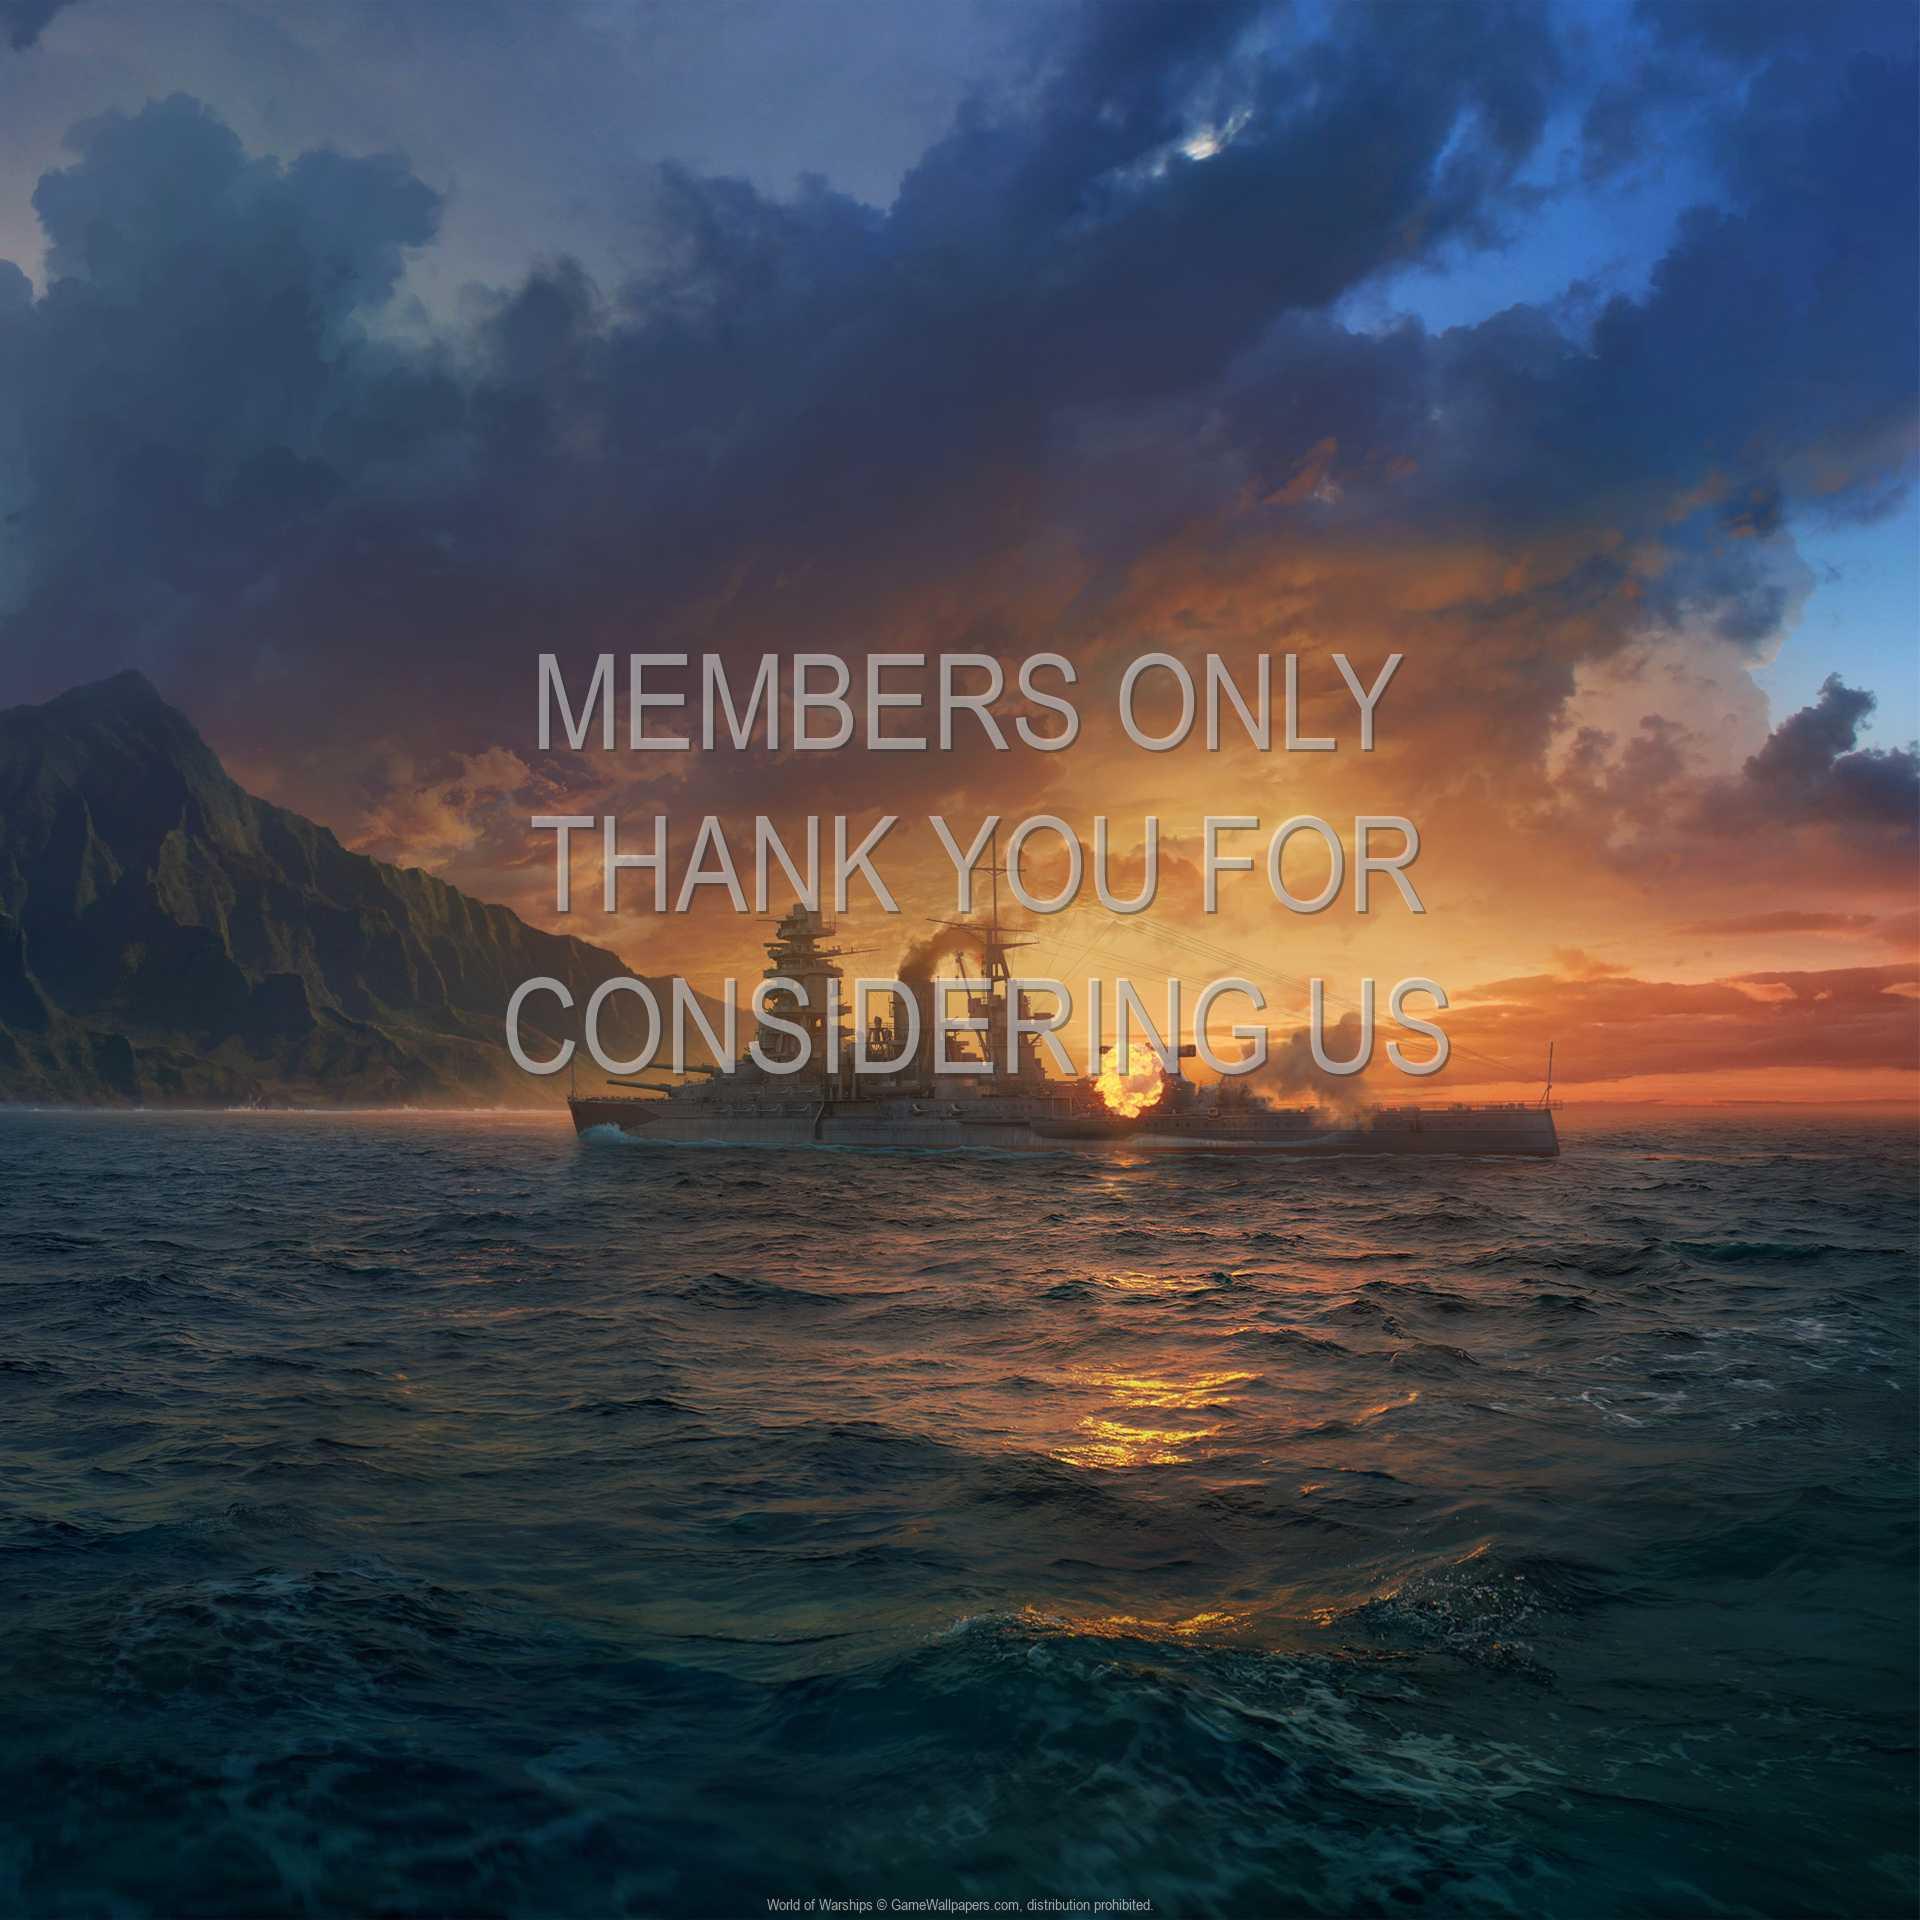 World of Warships 1080p Horizontal Mobile wallpaper or background 11